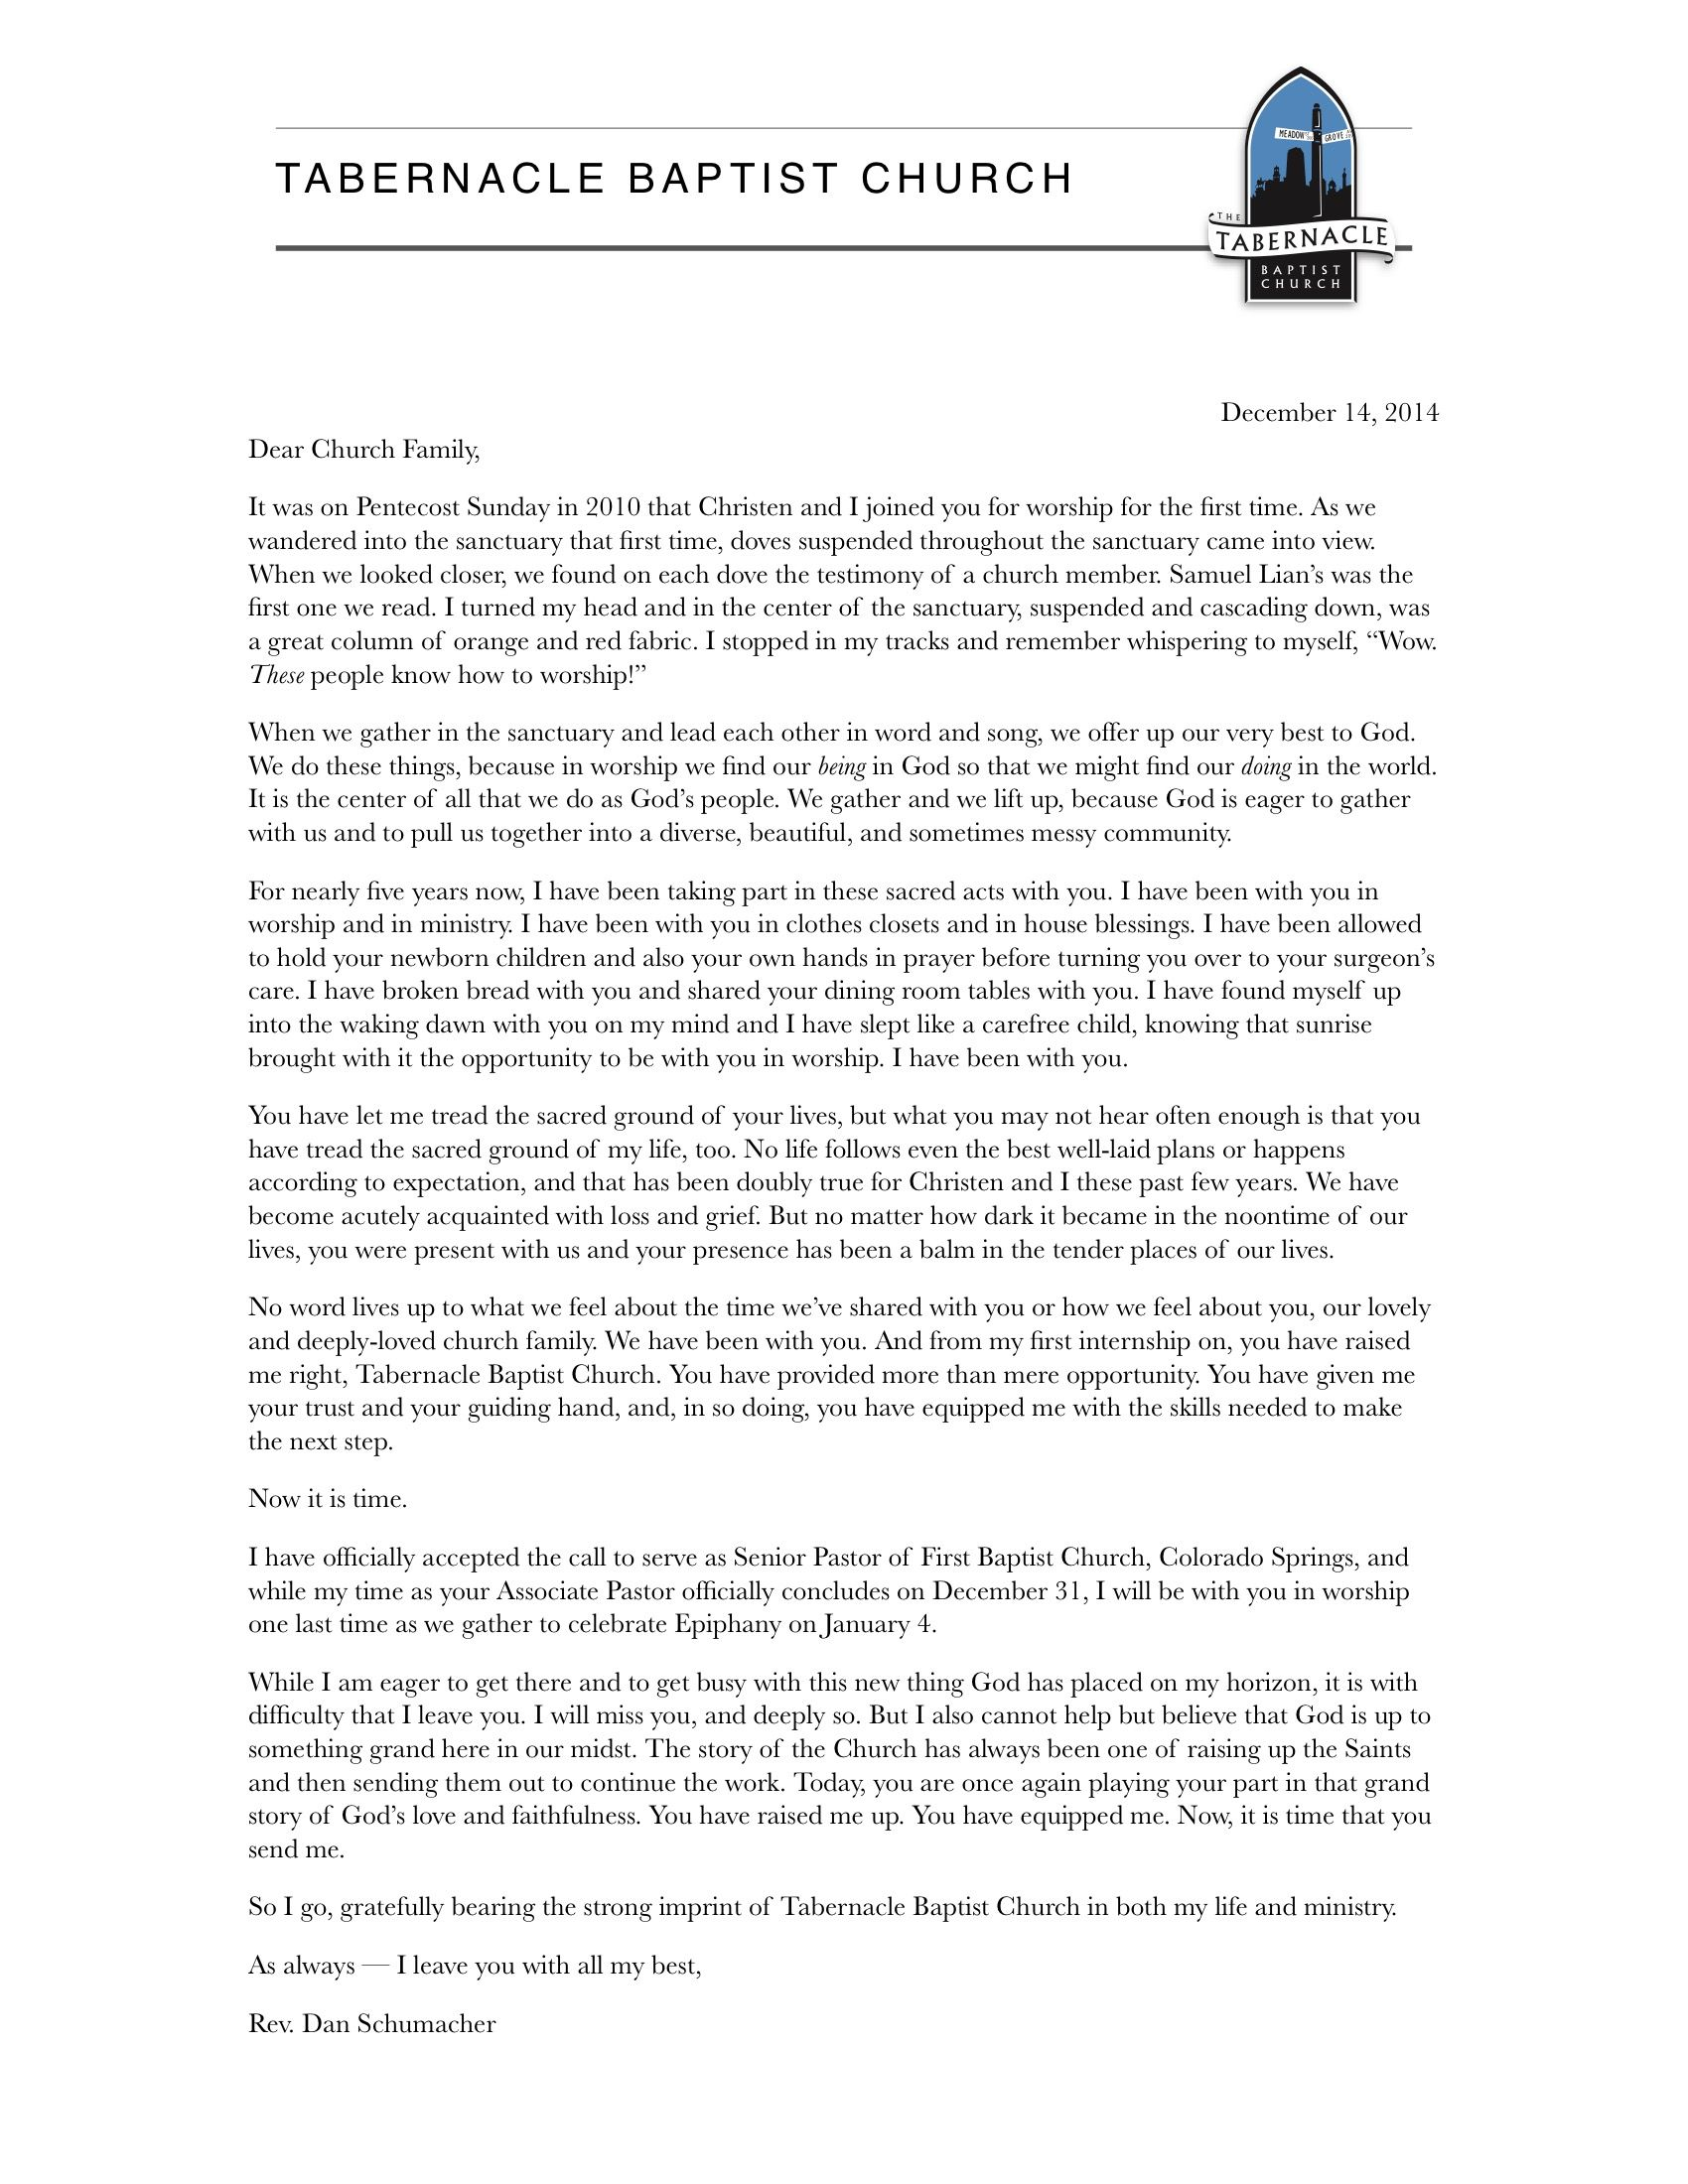 Pastor letter resignation resume layout create home design idea pastor letter resignation resume layout create aljukfo Images